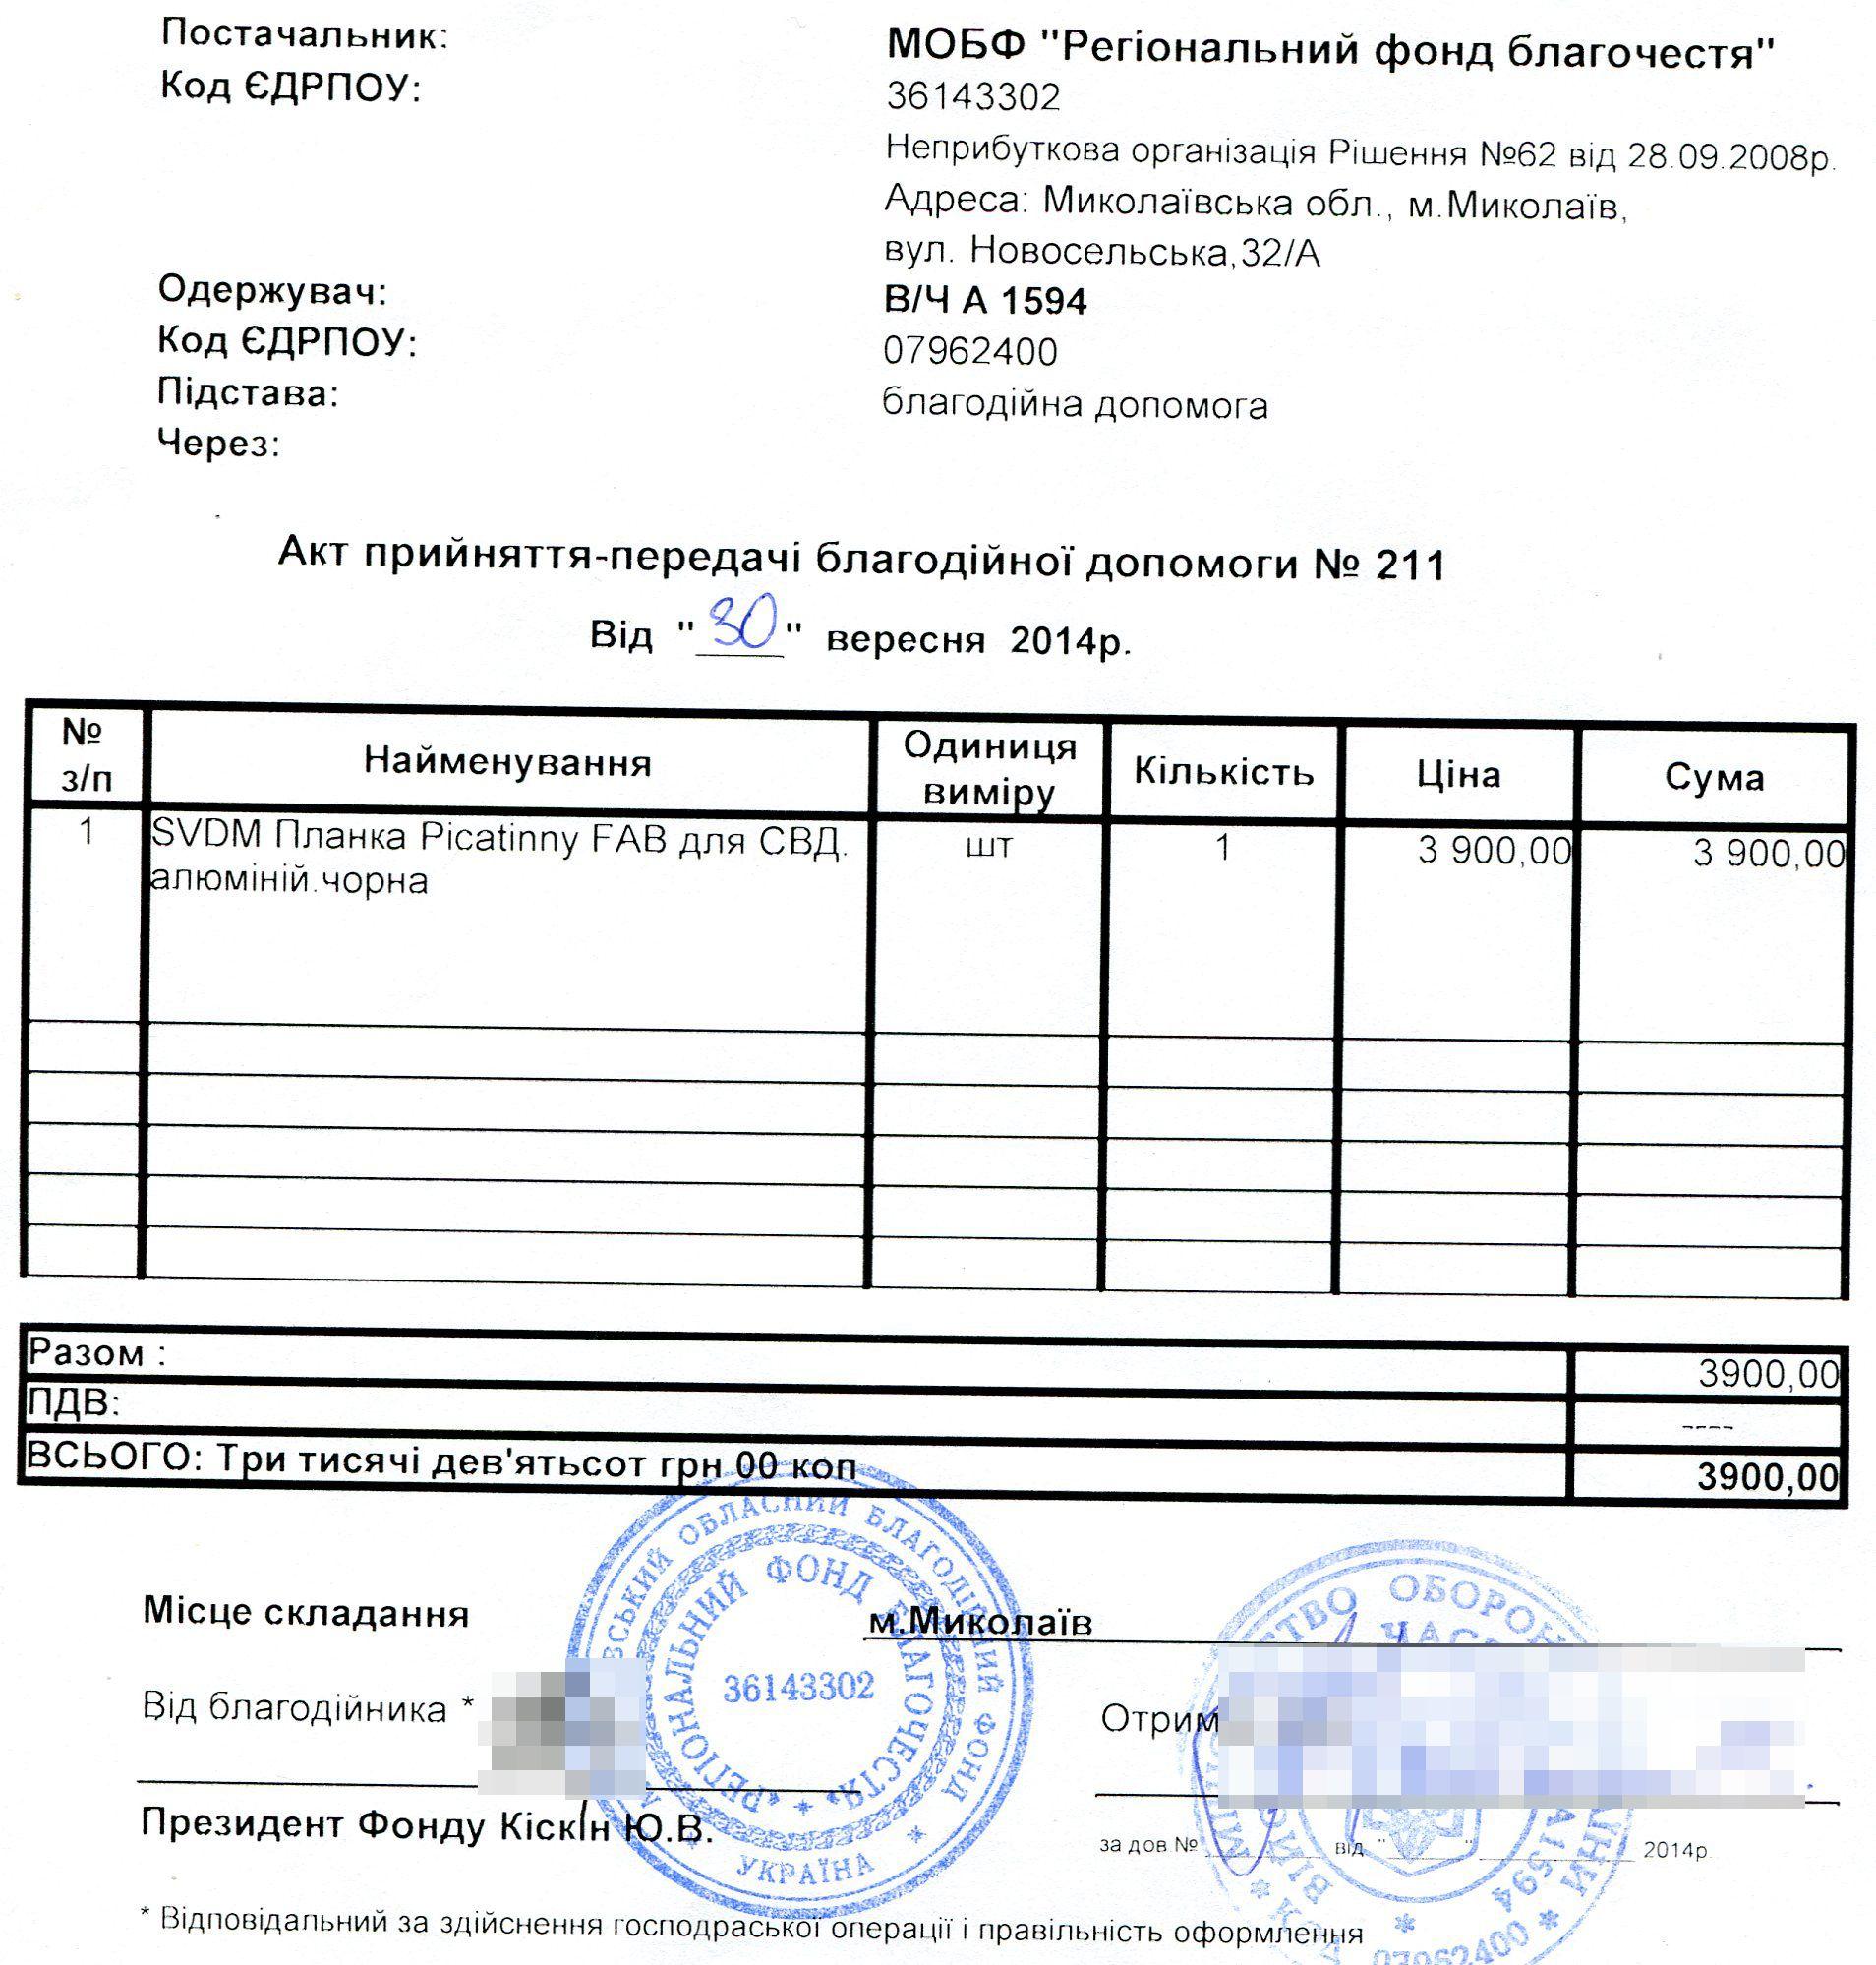 Akt-priema-peredachi-fond-konshtejn-pod-planku-Pikatinni